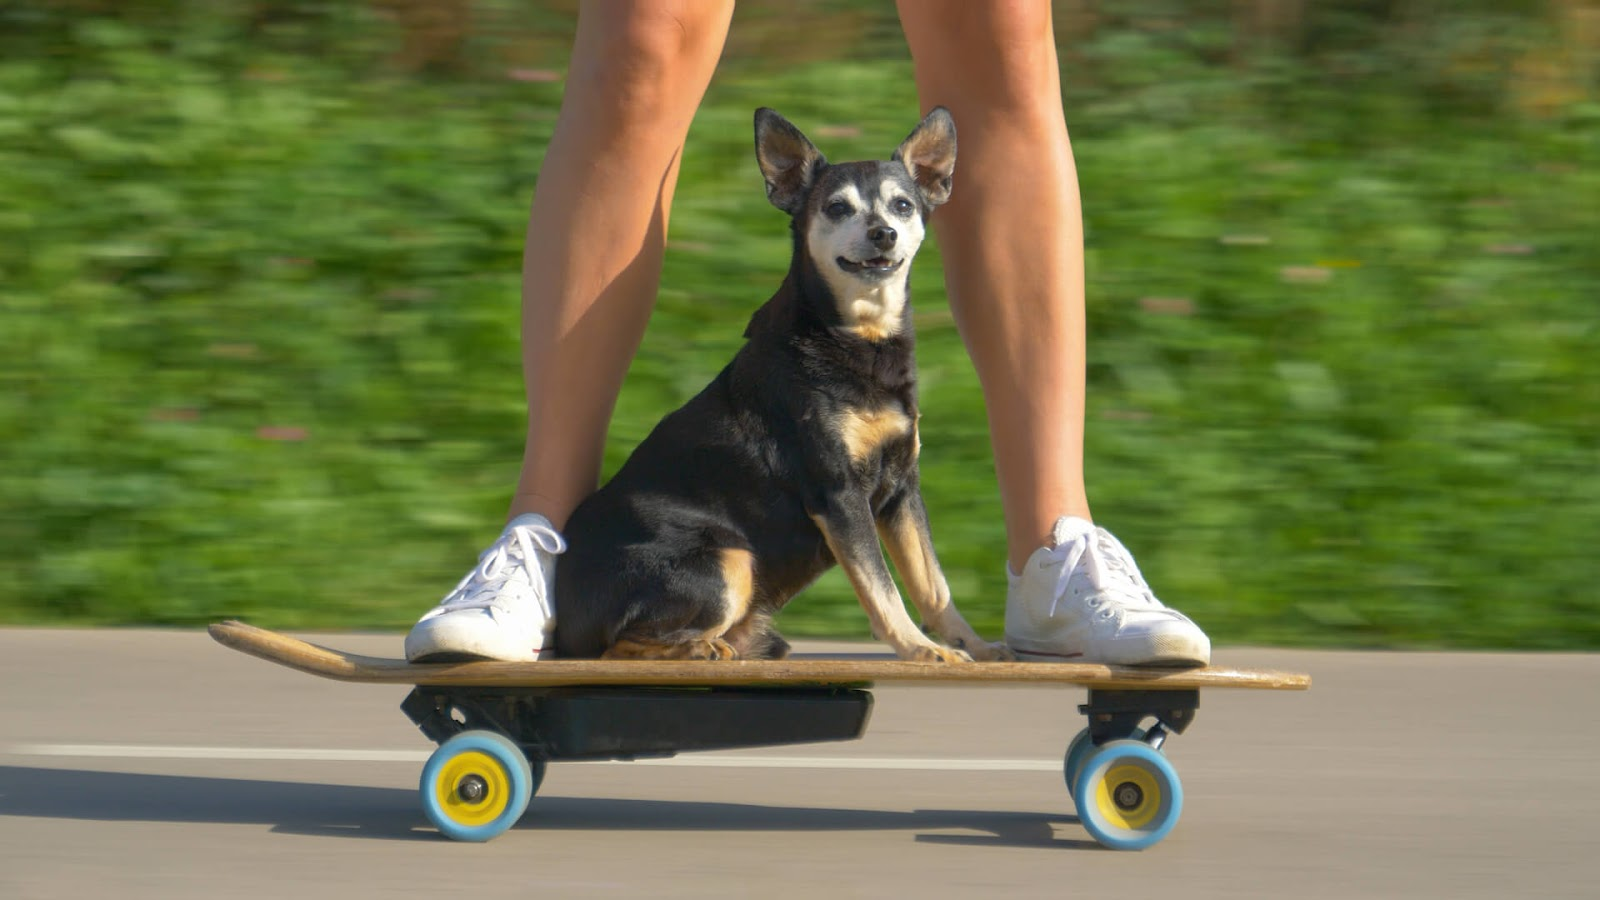 Dog Riding on a skateboard